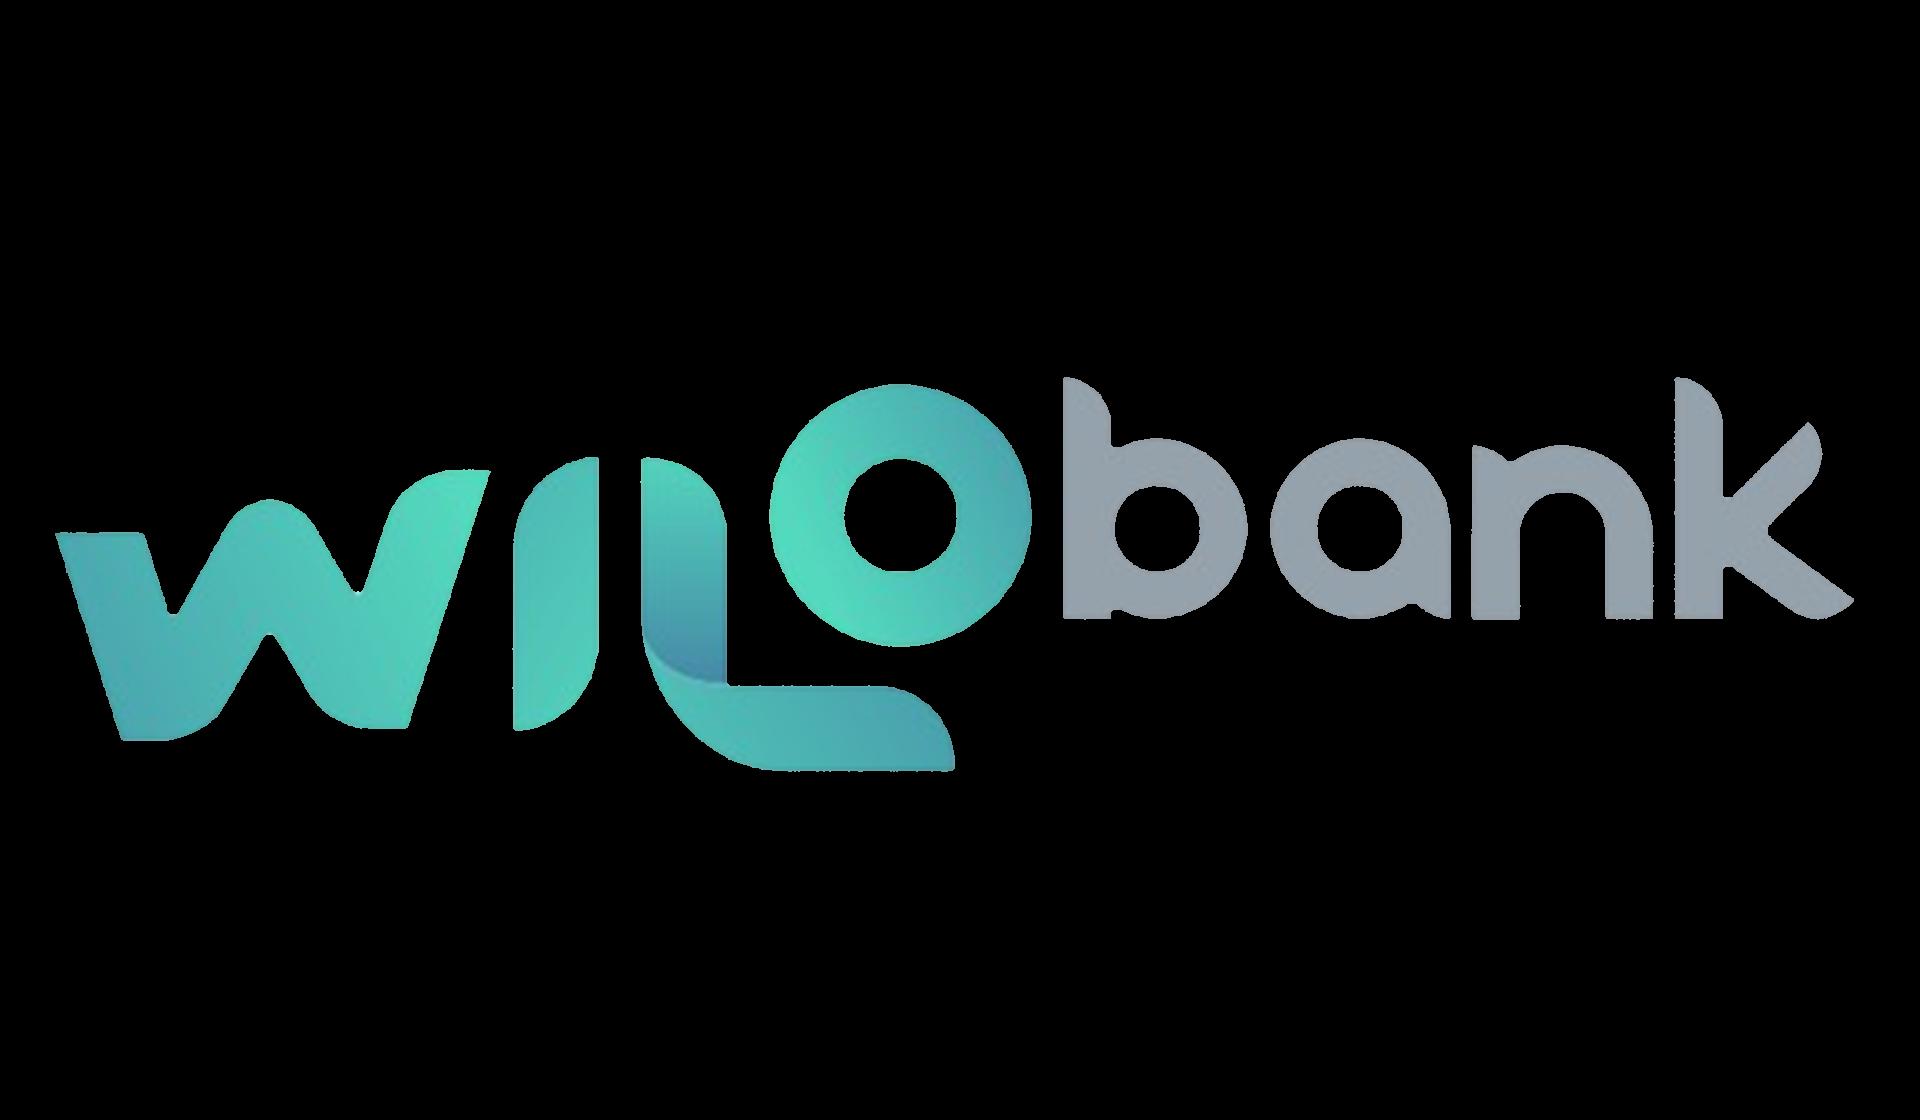 Wilobank logo